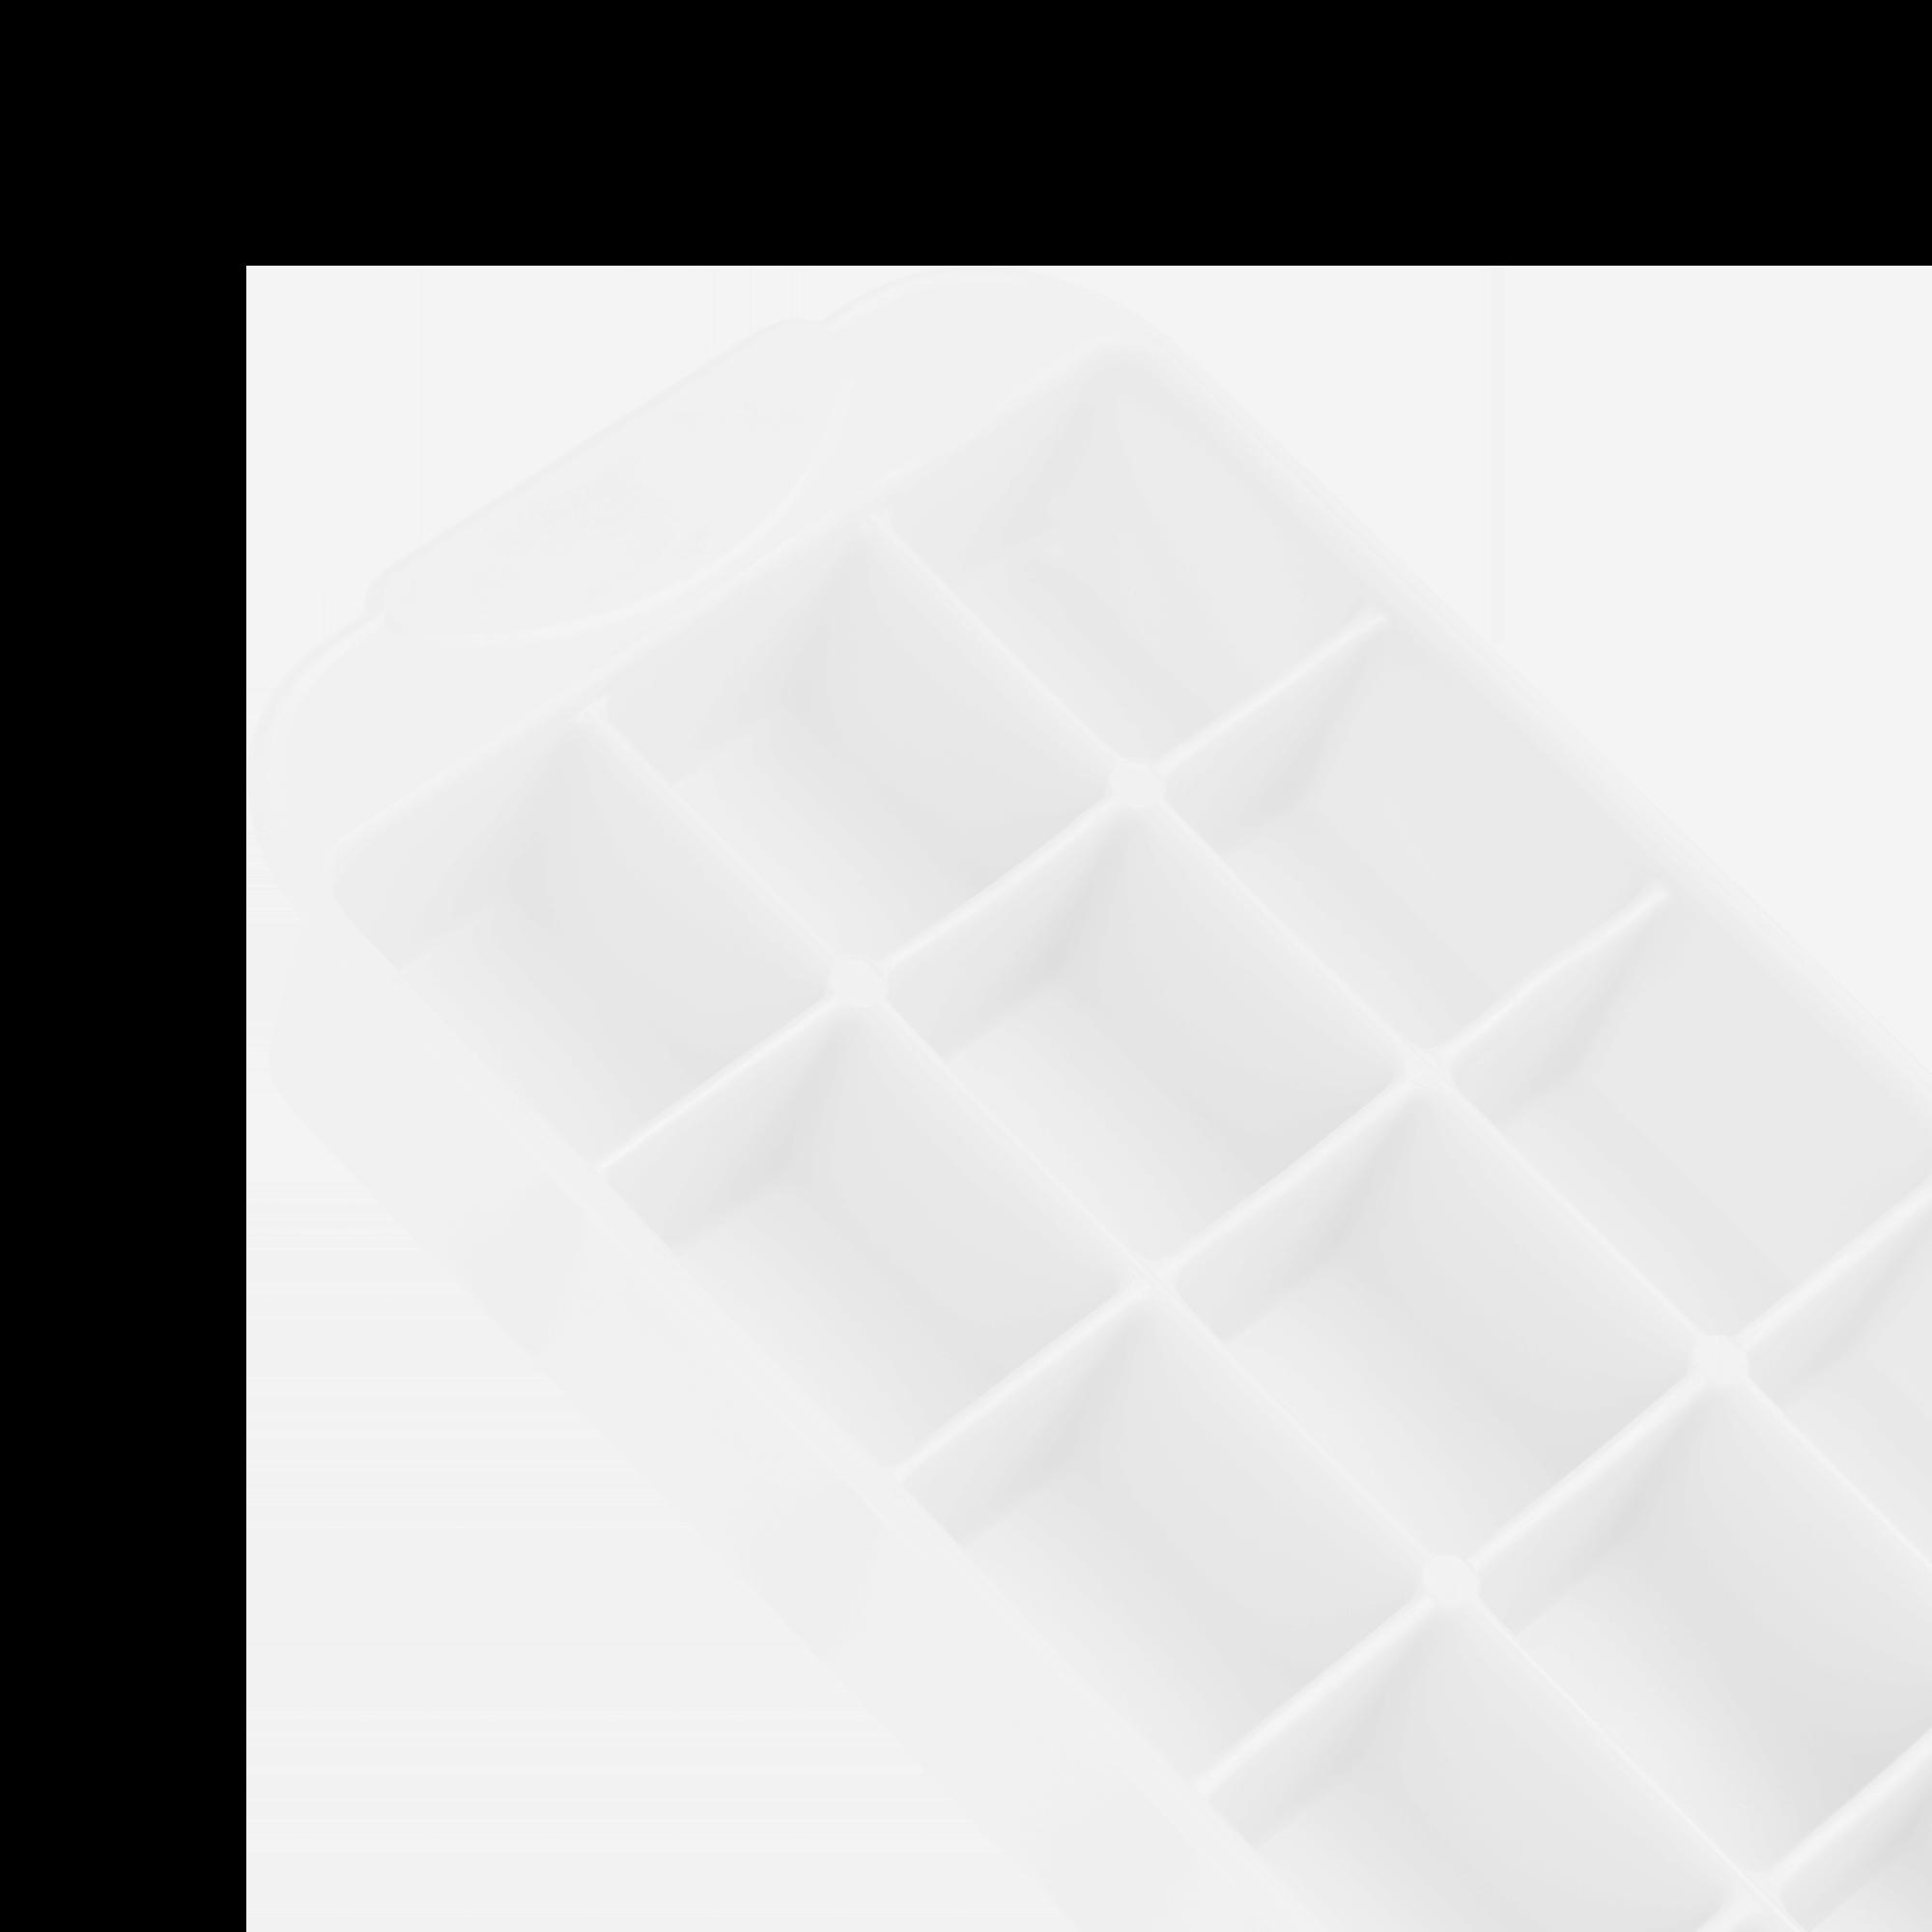 Eiswürfelformer flexibel